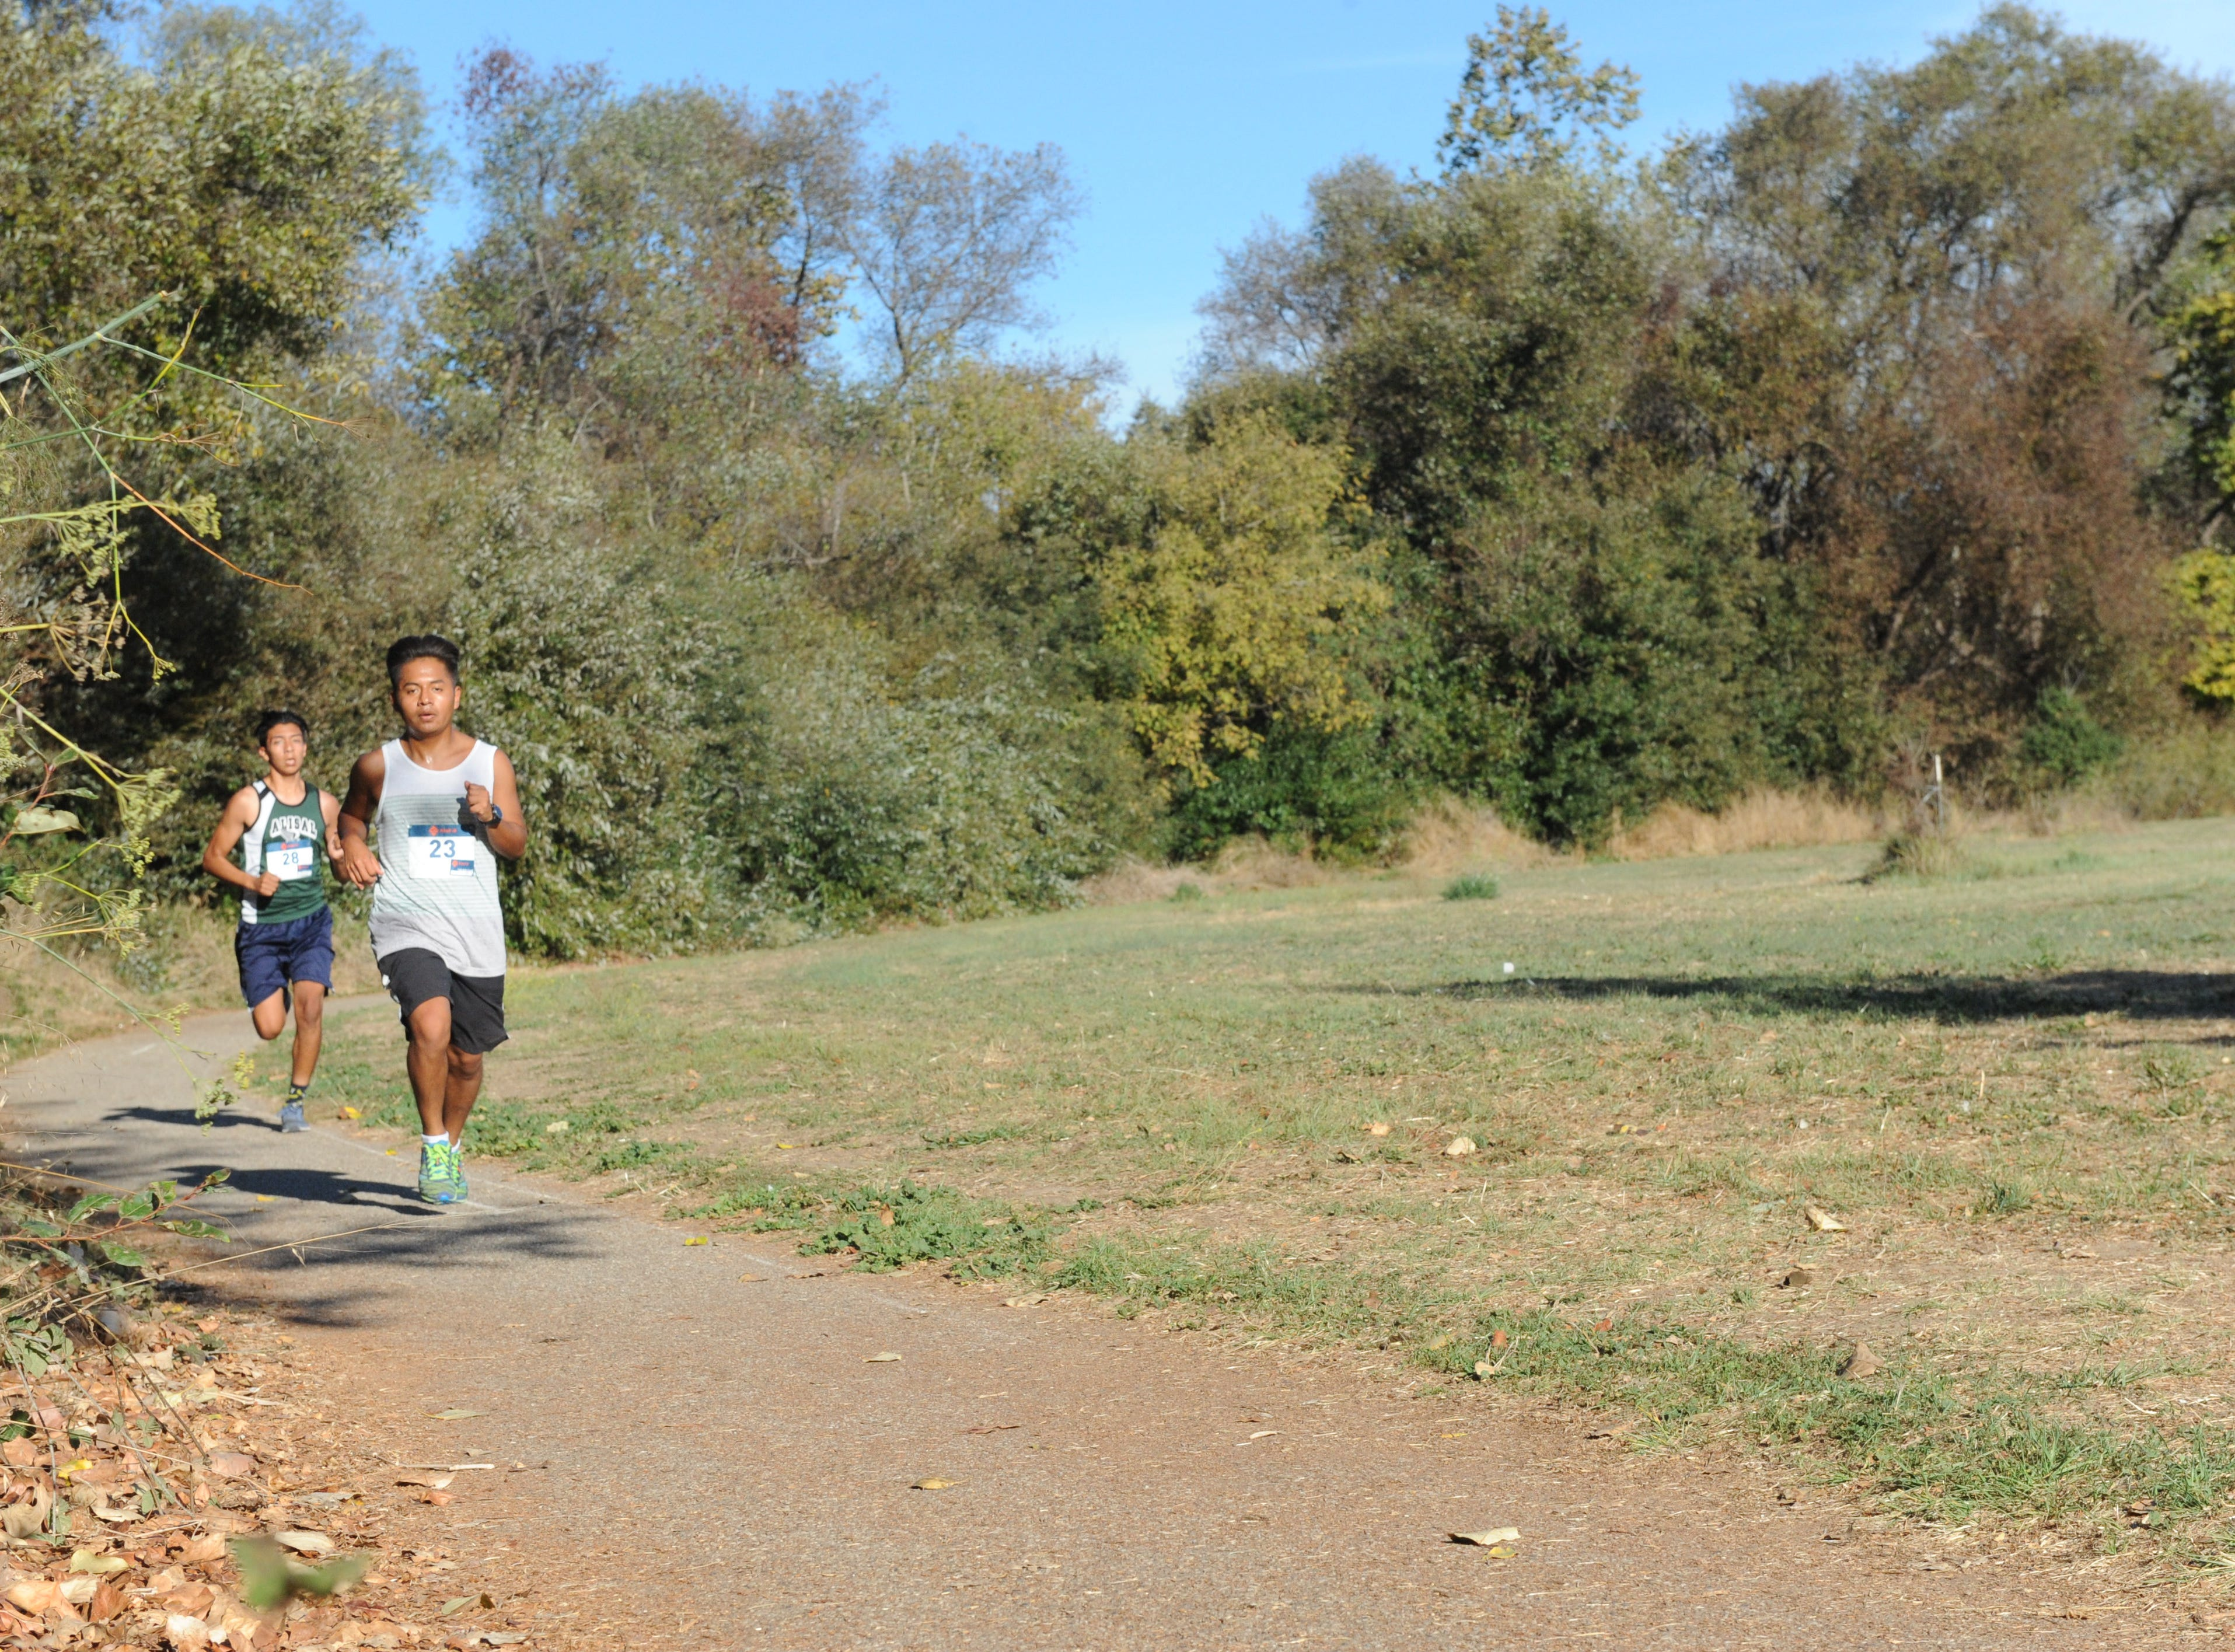 Paul Lazaro, 22, won Sunday's Día de los Muertos race, while Bryan Gomez, 16, placed second.